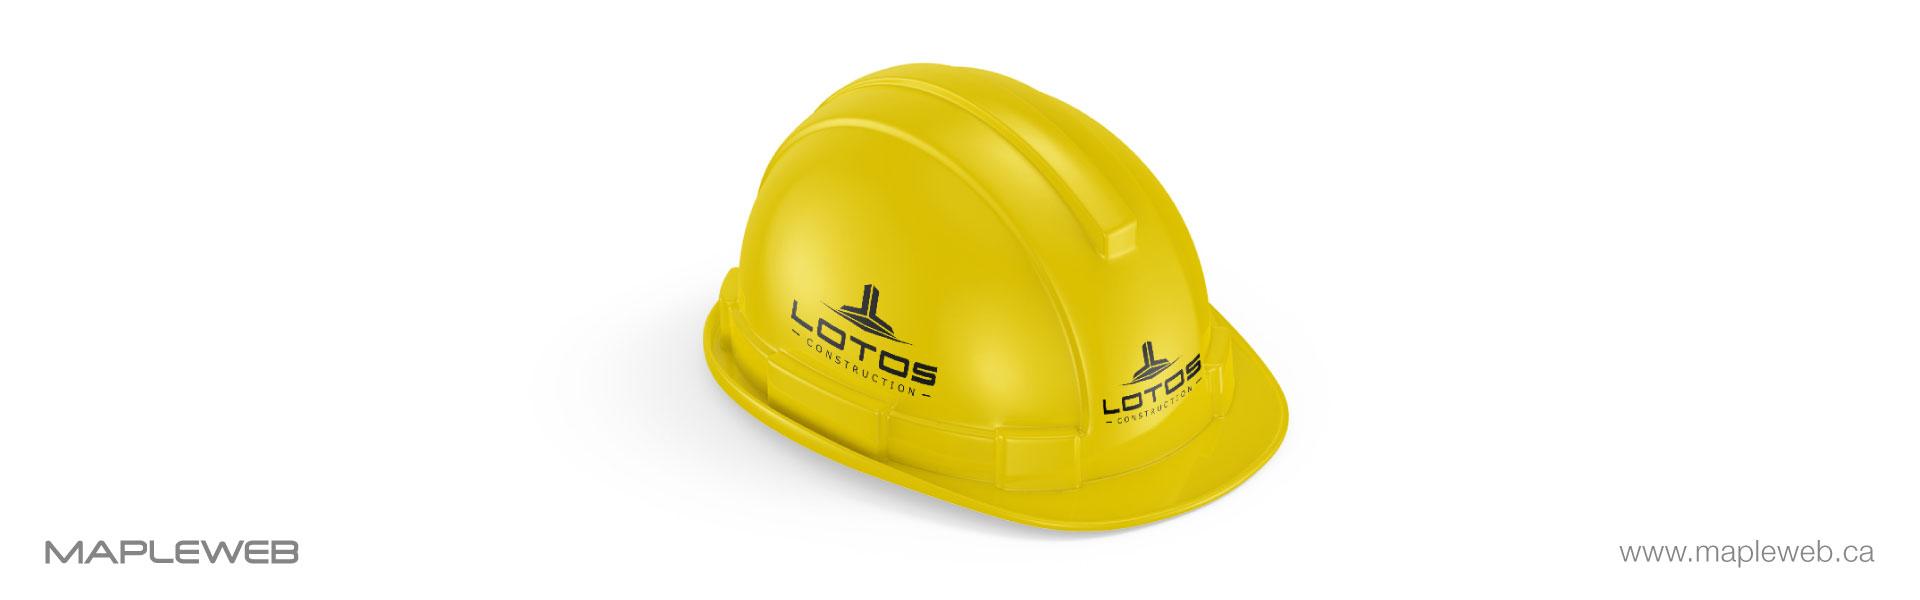 lotos-construction-brand-logo-design-by-mapleweb-vancouver-canada-yellow-measurement-tools-mock